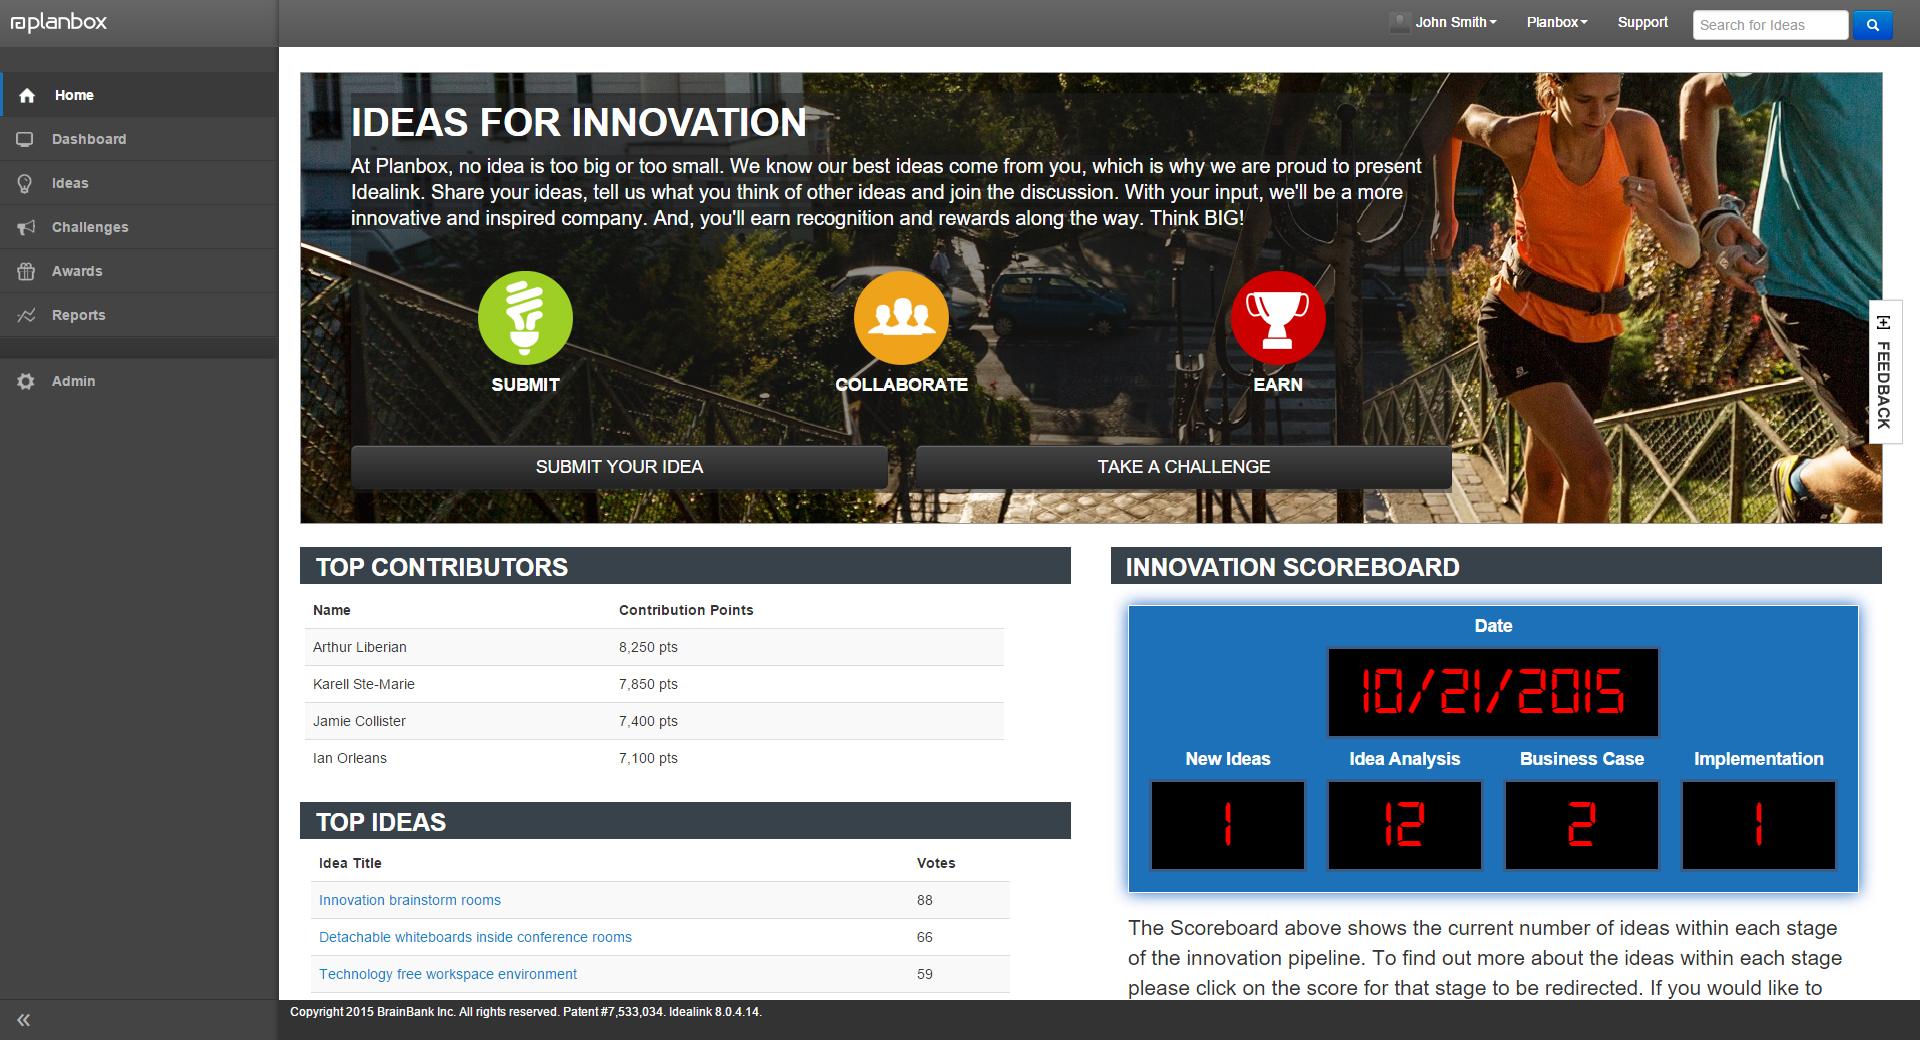 Planbox Innovate innovation and feedback portal